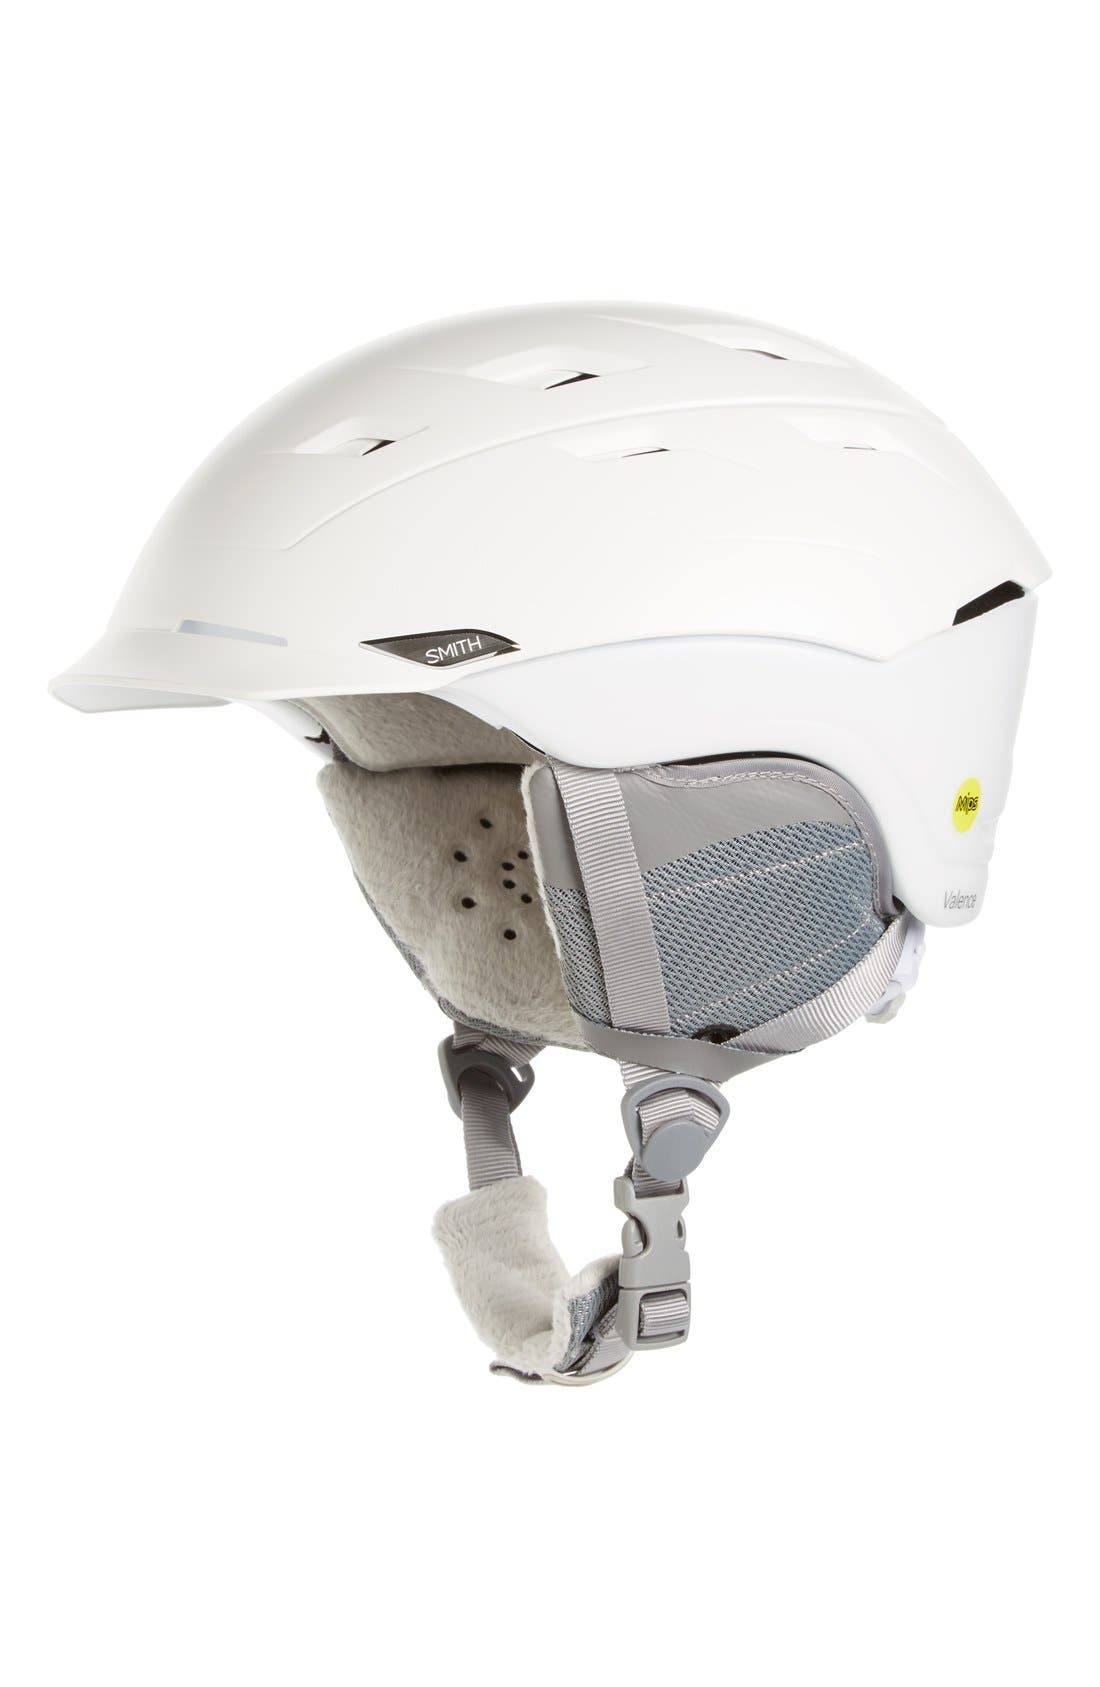 Valence Snow Helmet,                             Main thumbnail 1, color,                             Satin White